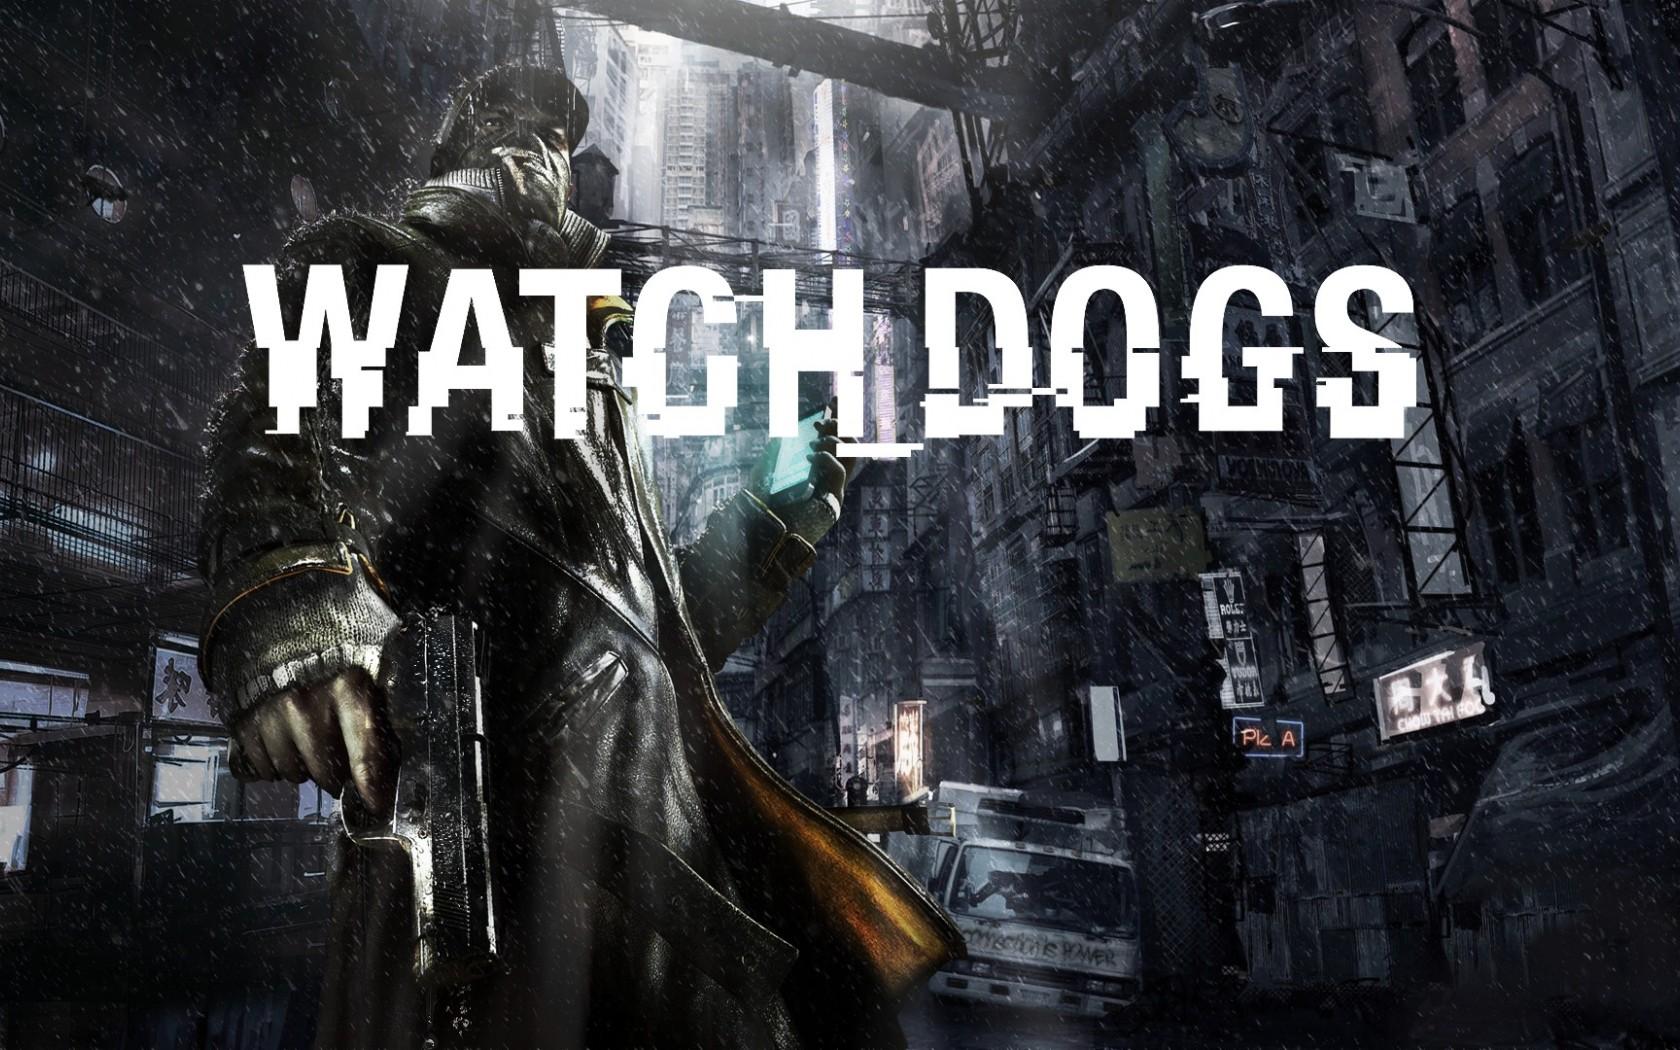 watch dogs 4k 2014 - photo #3